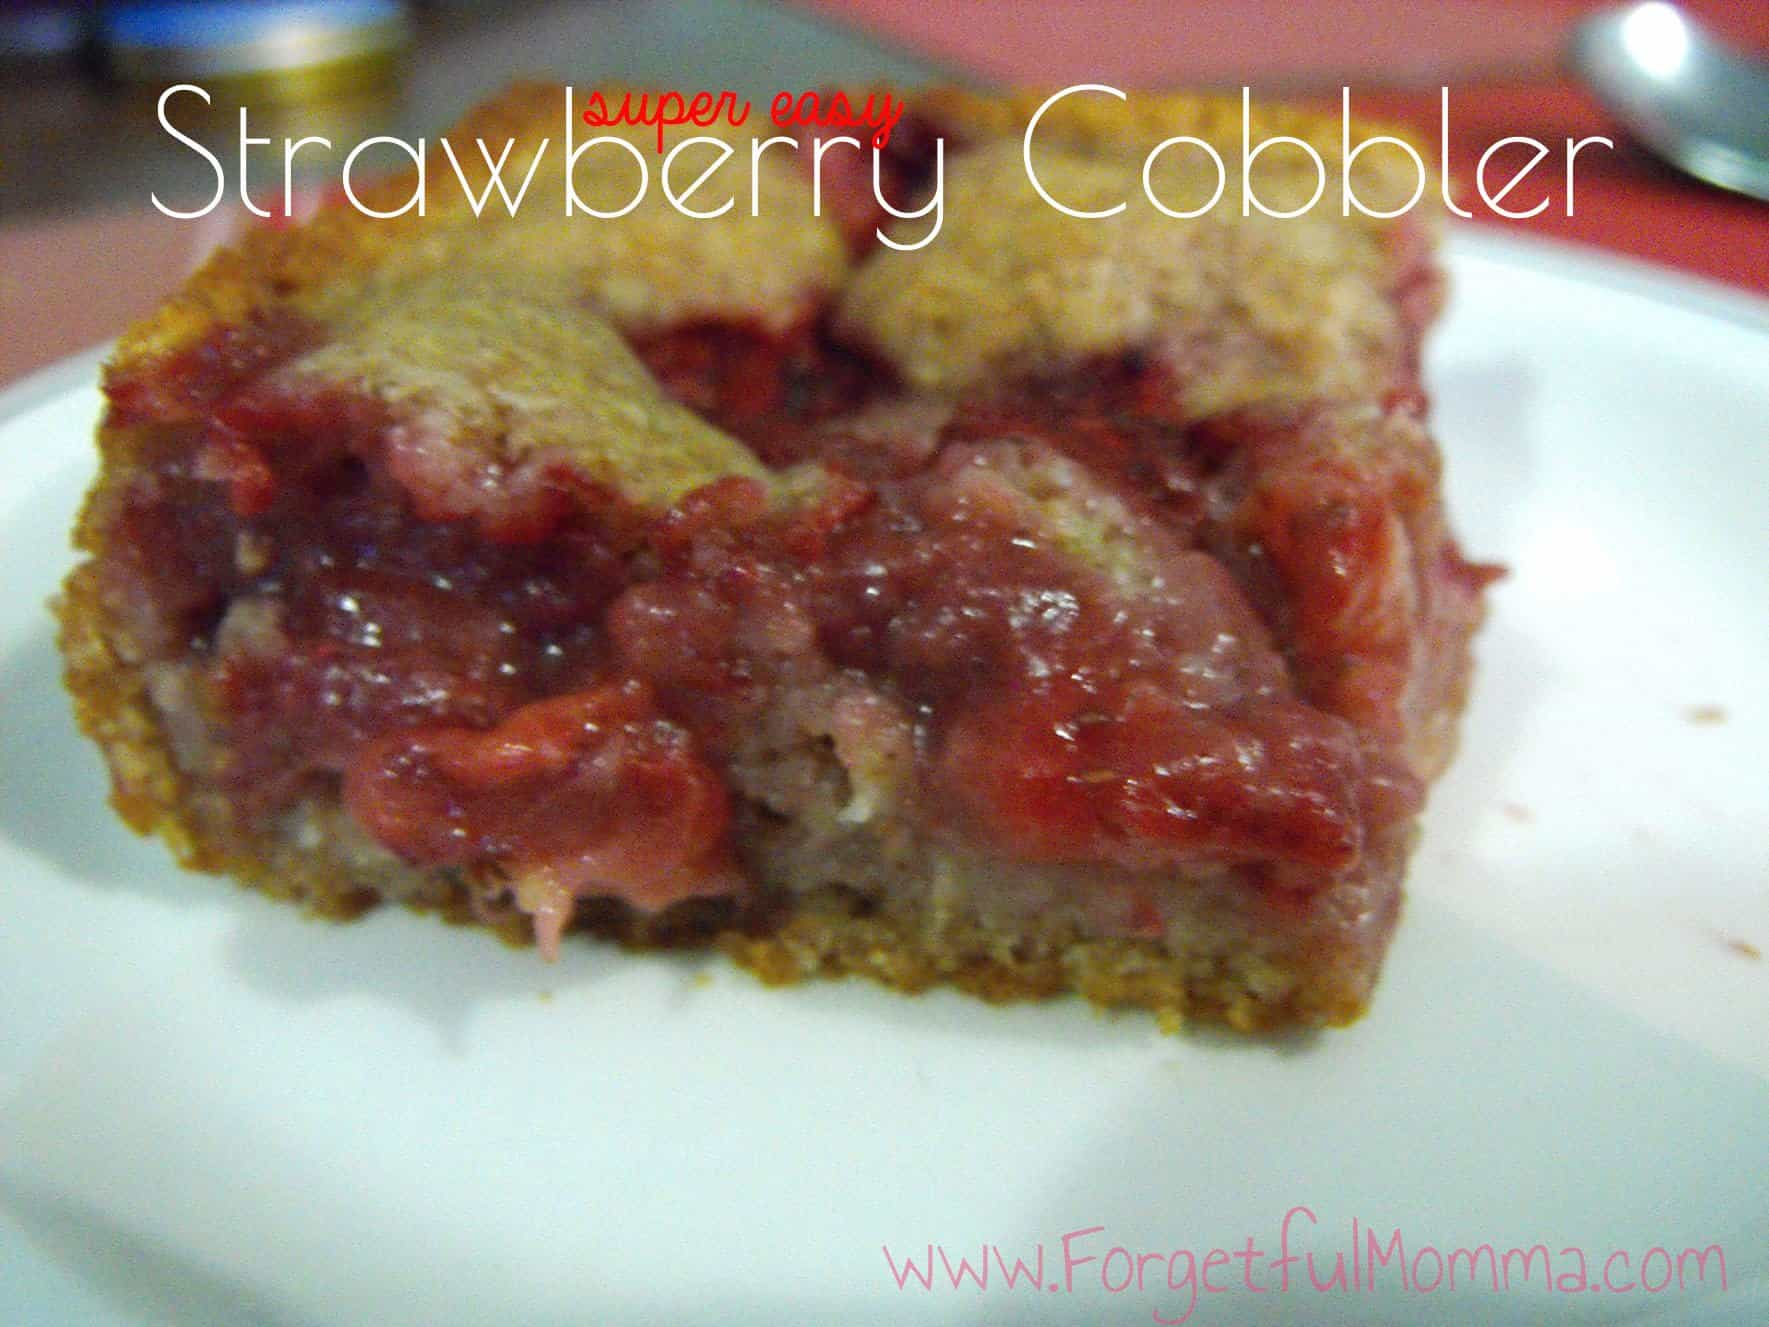 Tasty Strawberry Cobbler